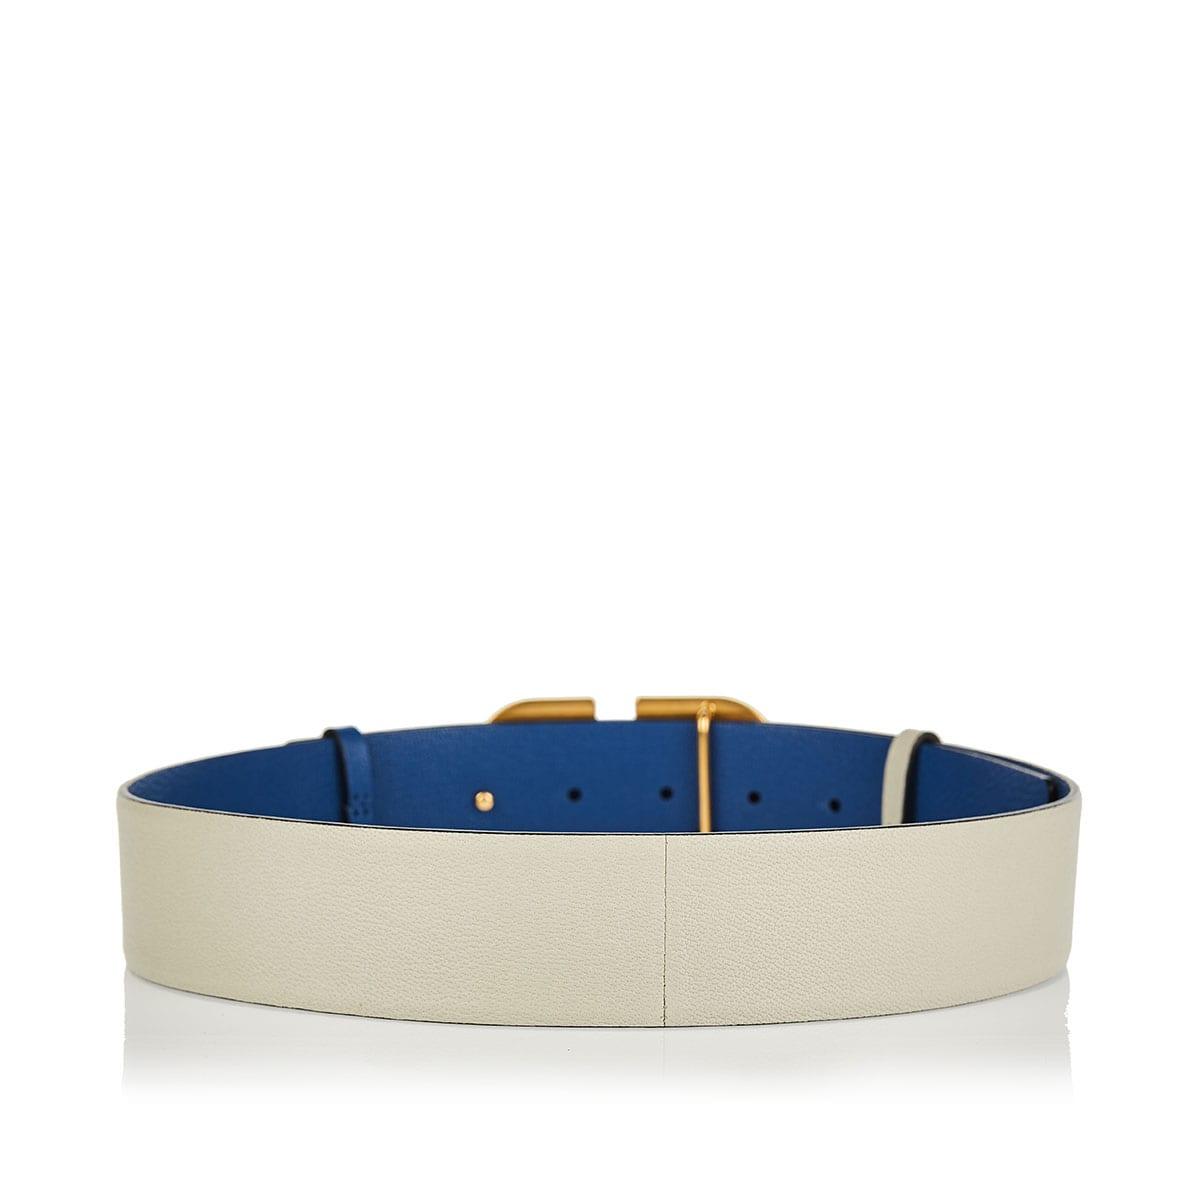 Vlogo reversible leather belt